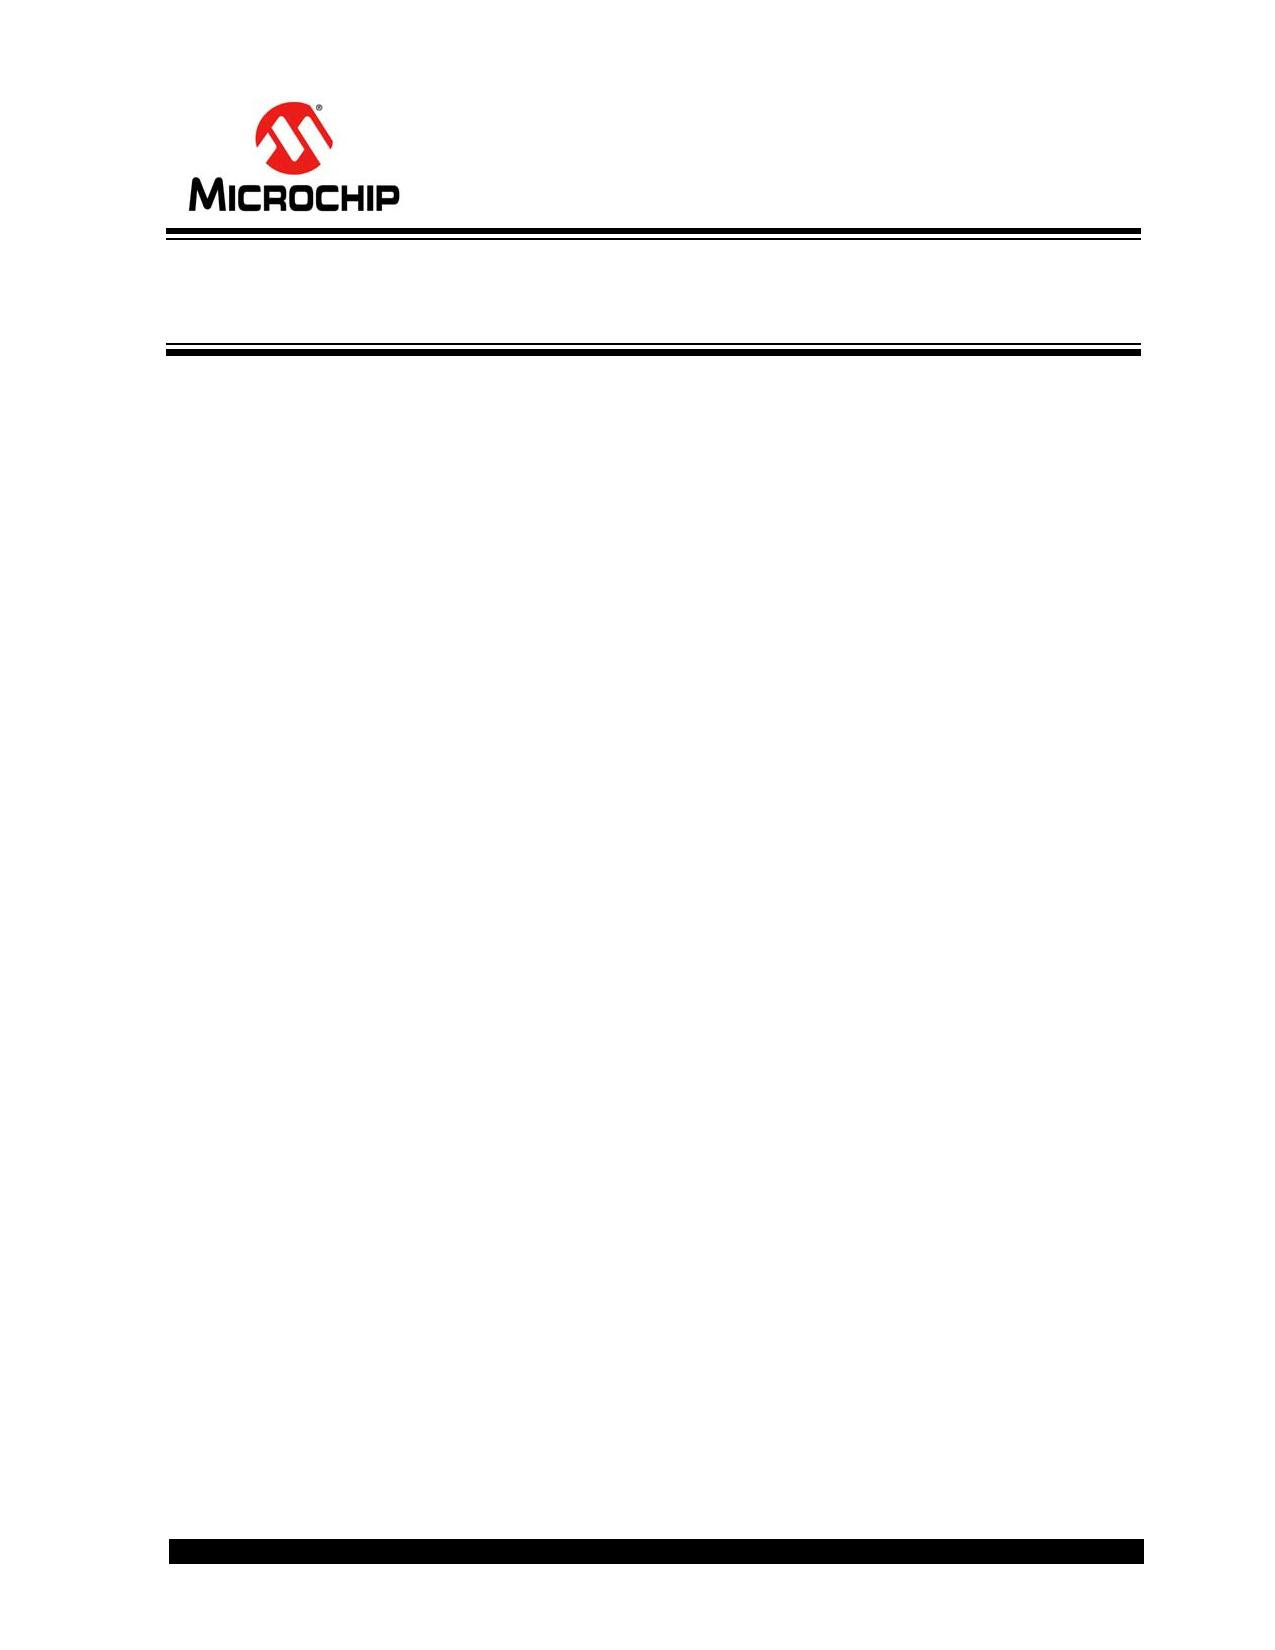 PIC24FV16KA302 데이터시트 및 PIC24FV16KA302 PDF